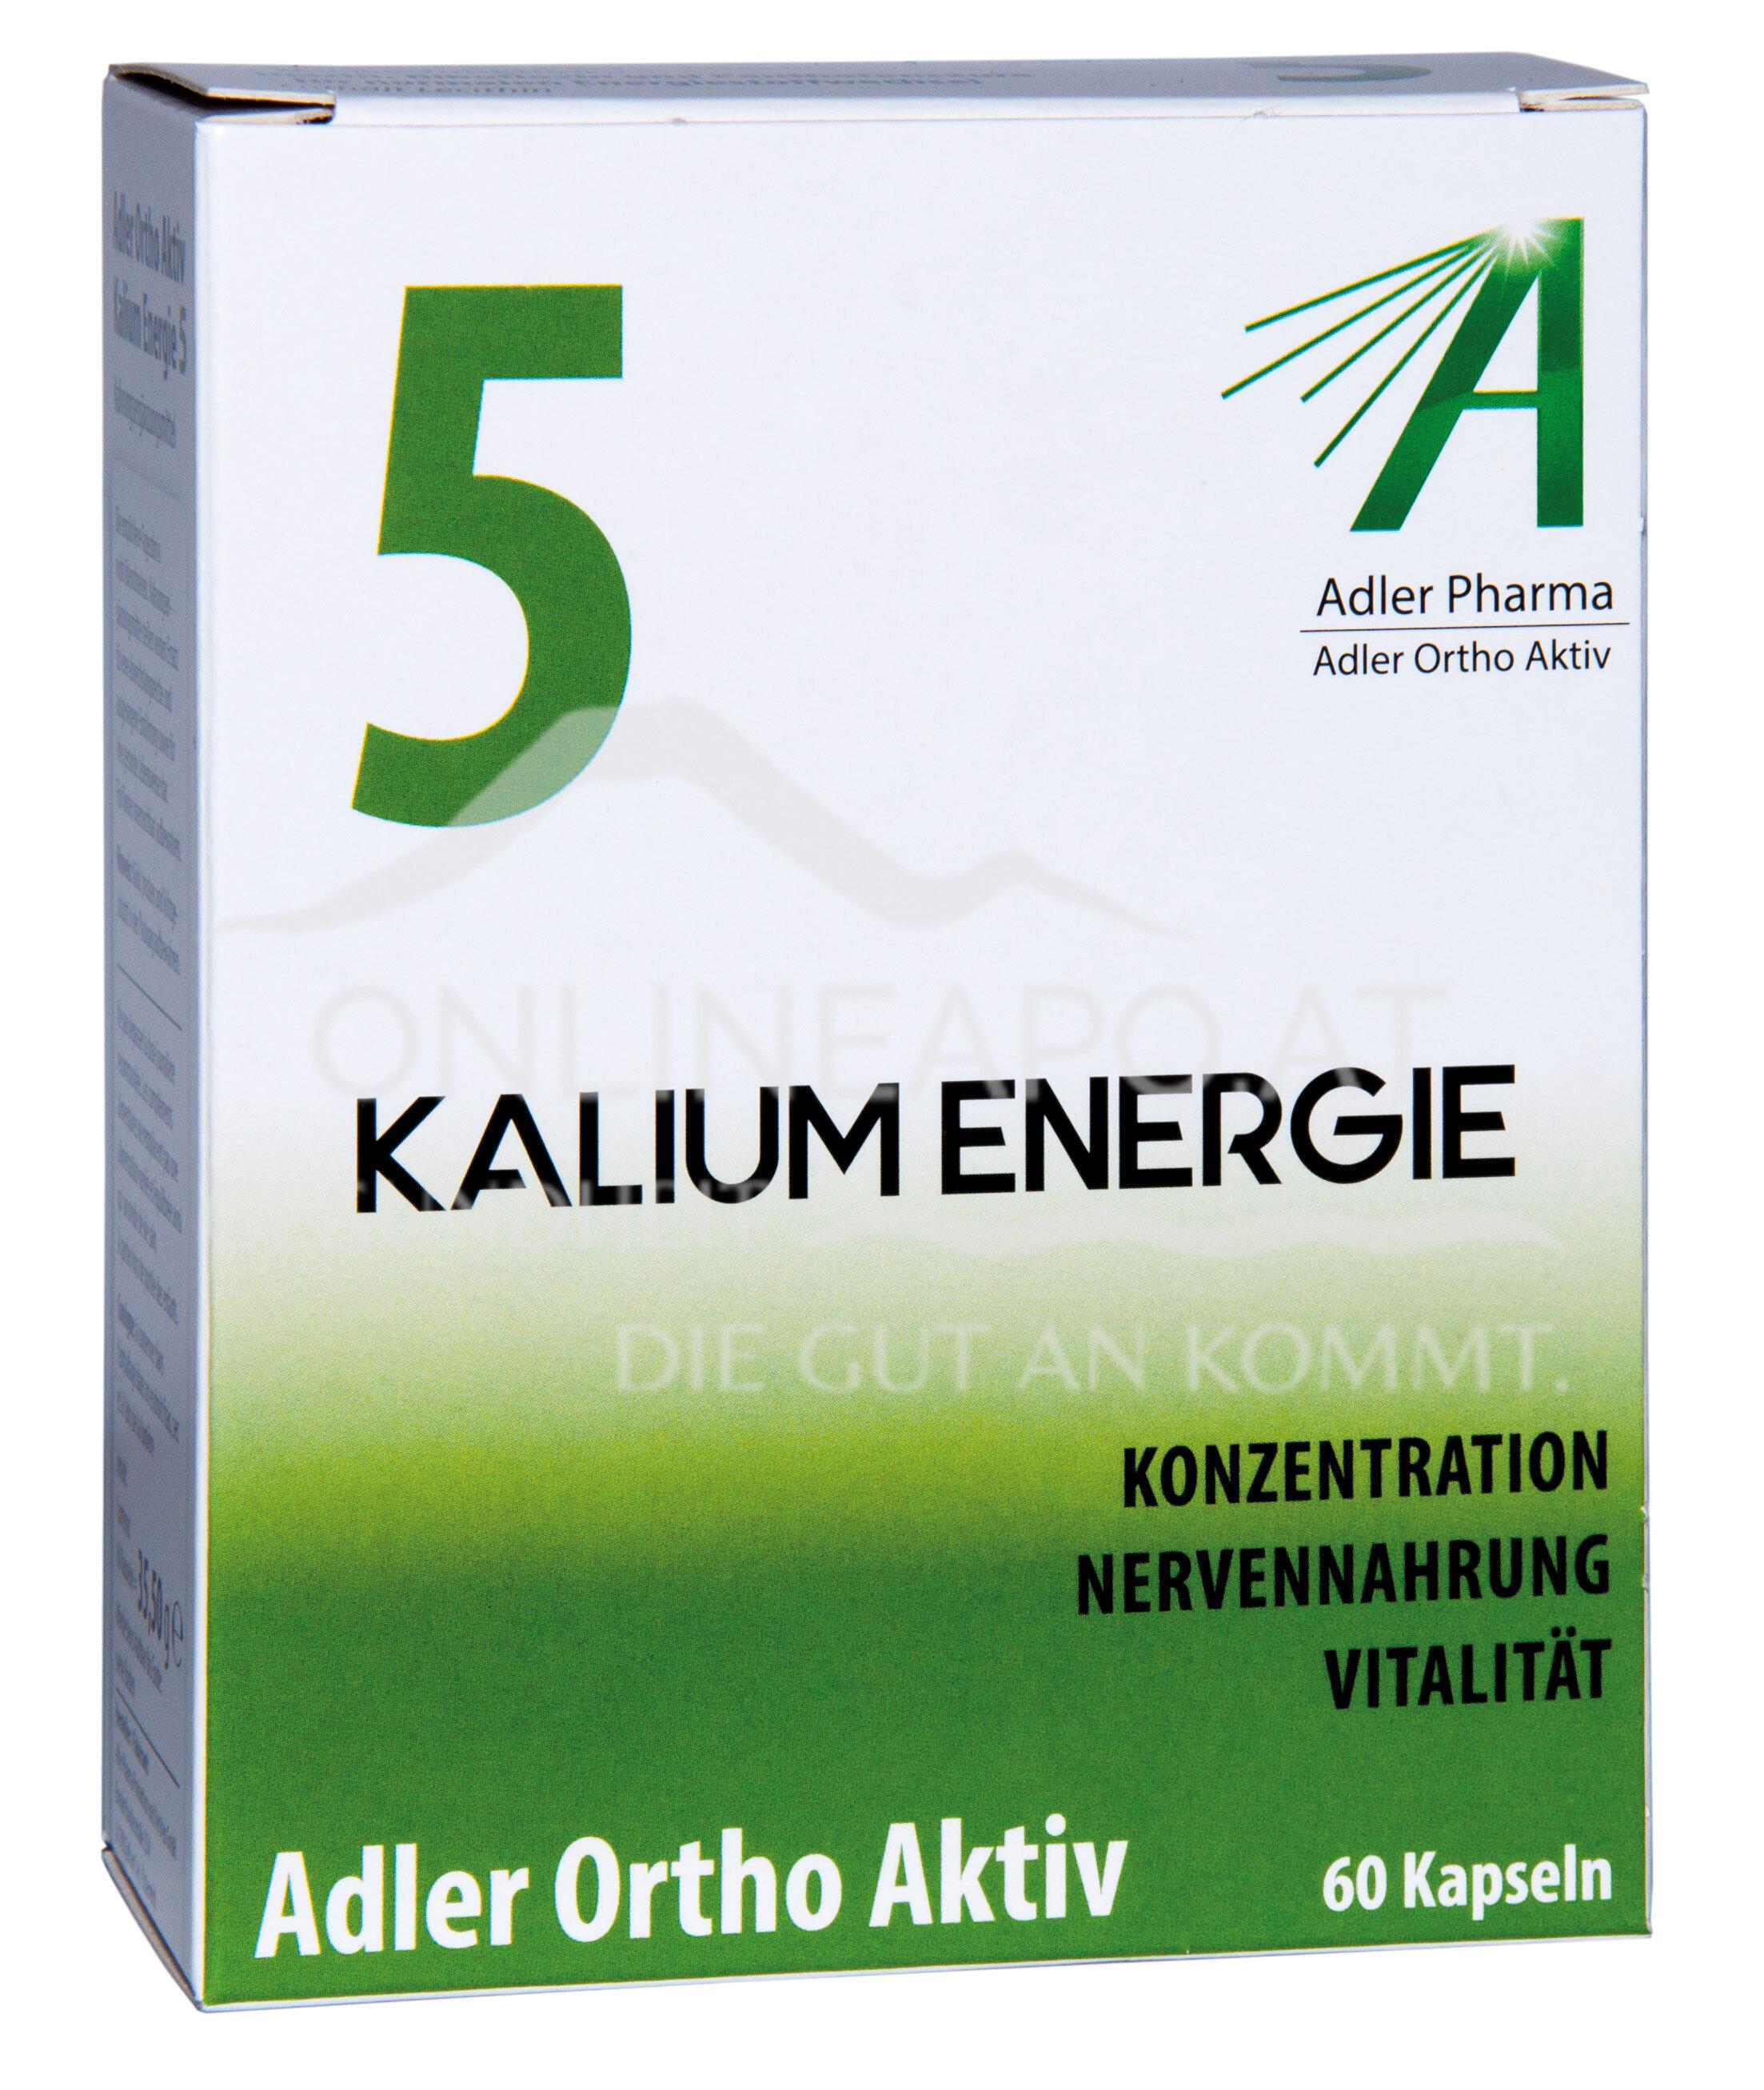 Adler Ortho Aktiv Nr. 5 Kalium Energie